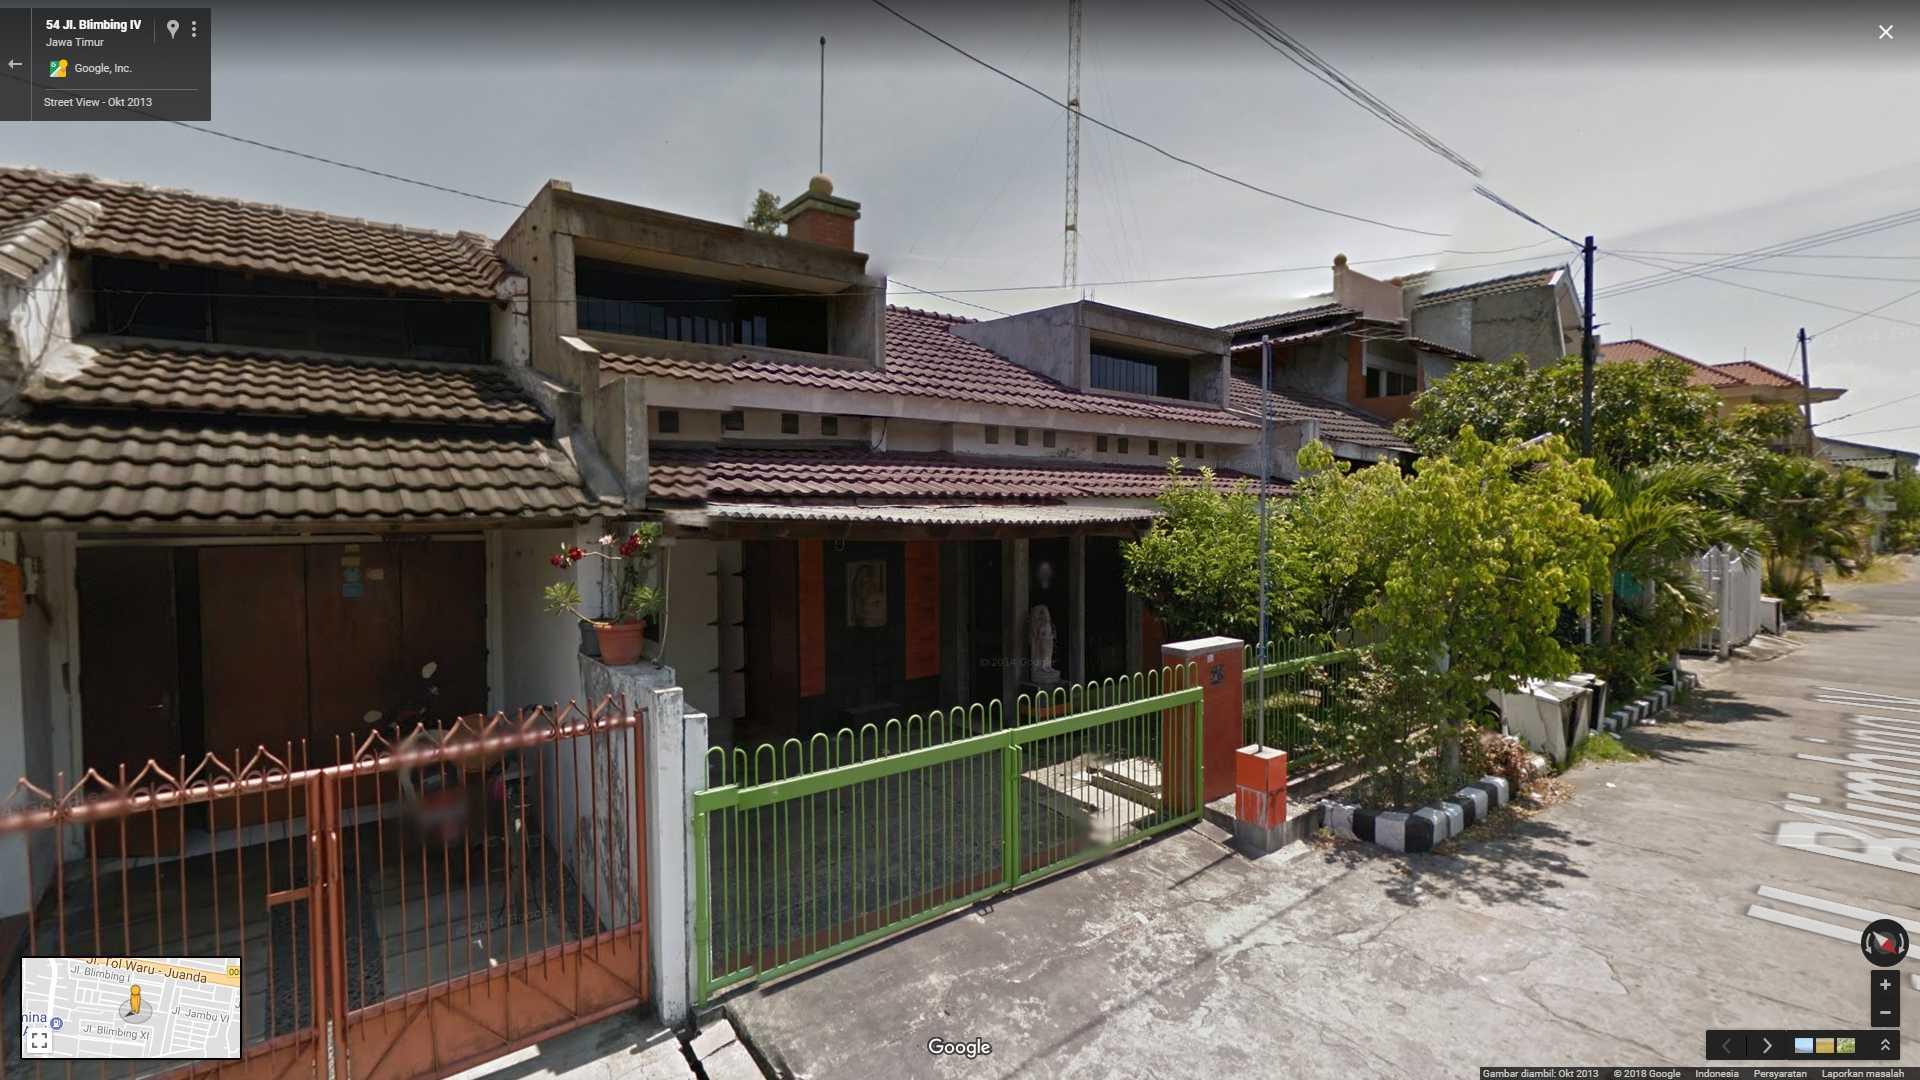 Bramasta Redy Rumarb Surabaya, Kota Sby, Jawa Timur, Indonesia Surabaya, Kota Sby, Jawa Timur, Indonesia Bramasta-Redy-Rumarb  65352